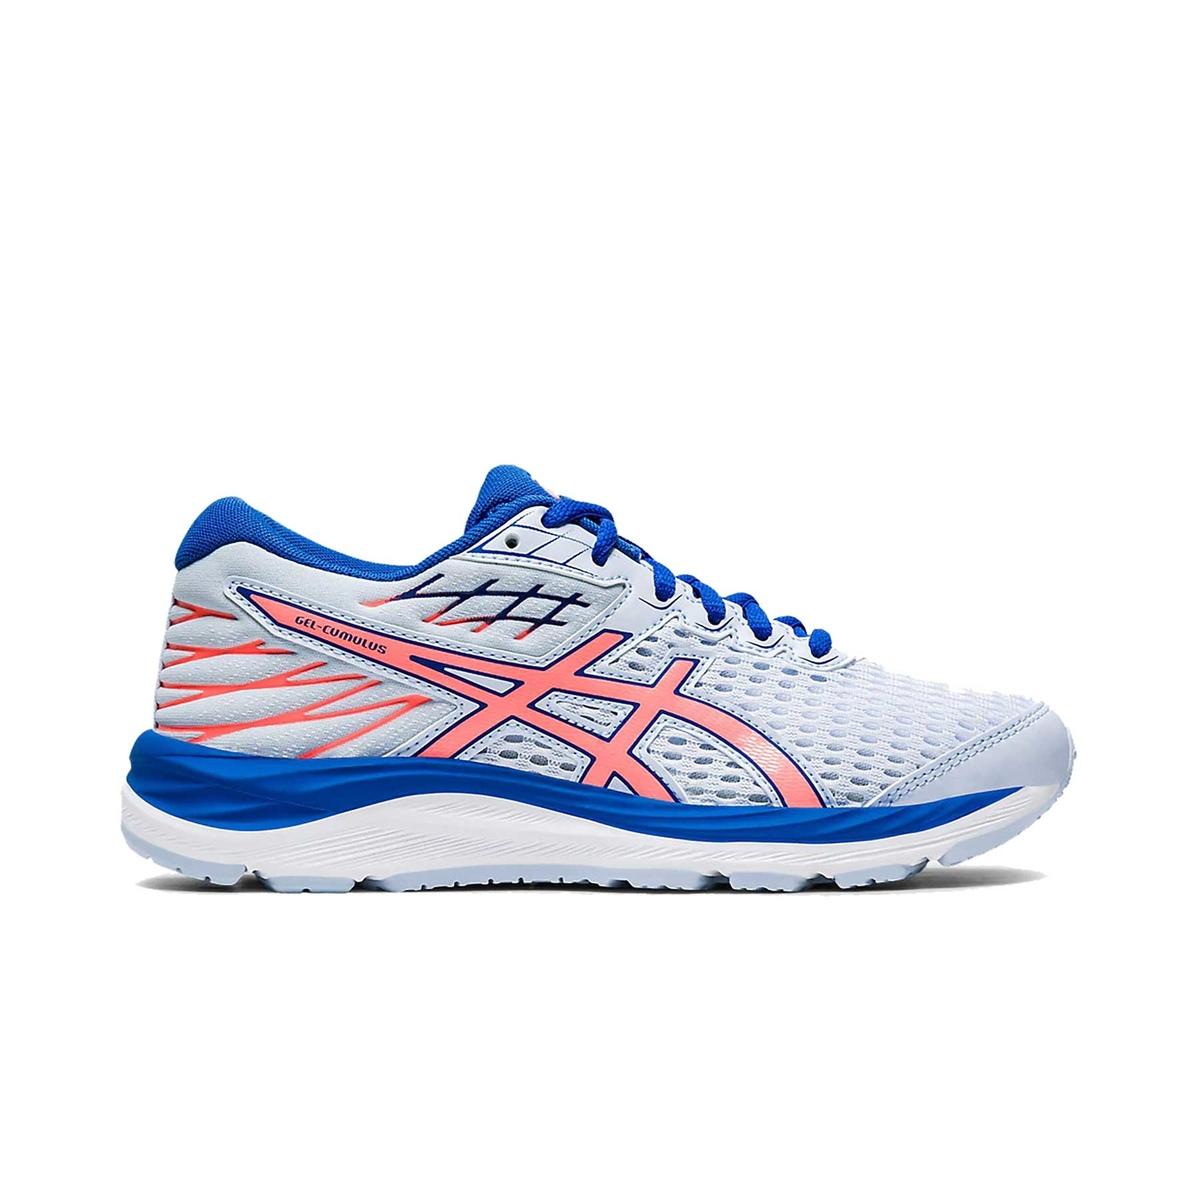 Outlet di scarpe da running Maxi Sport Adidas, Nike Bambino